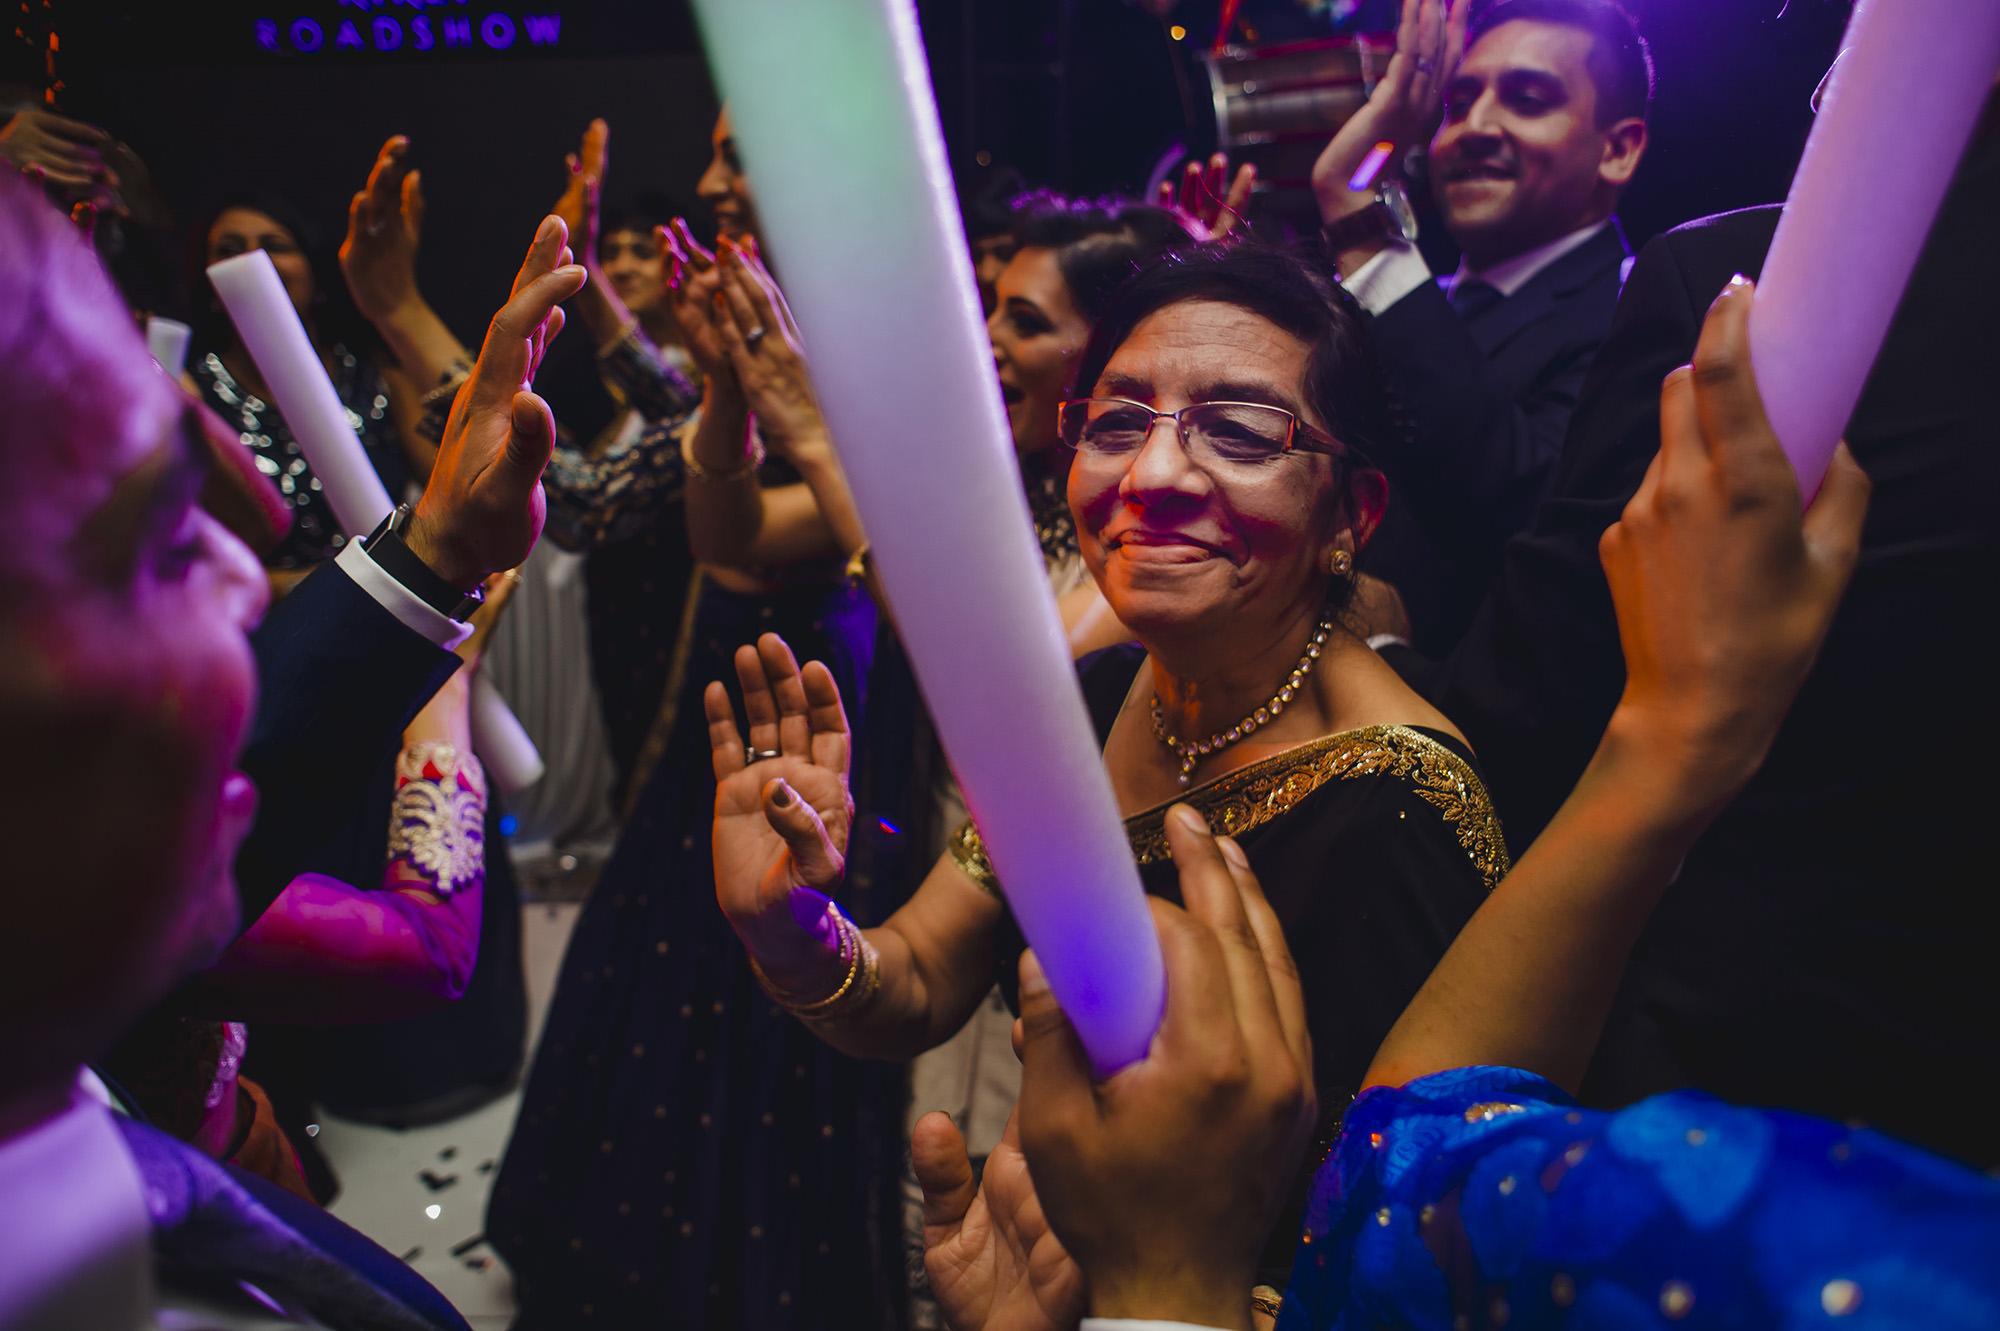 brides mum having fun on the dancefloor